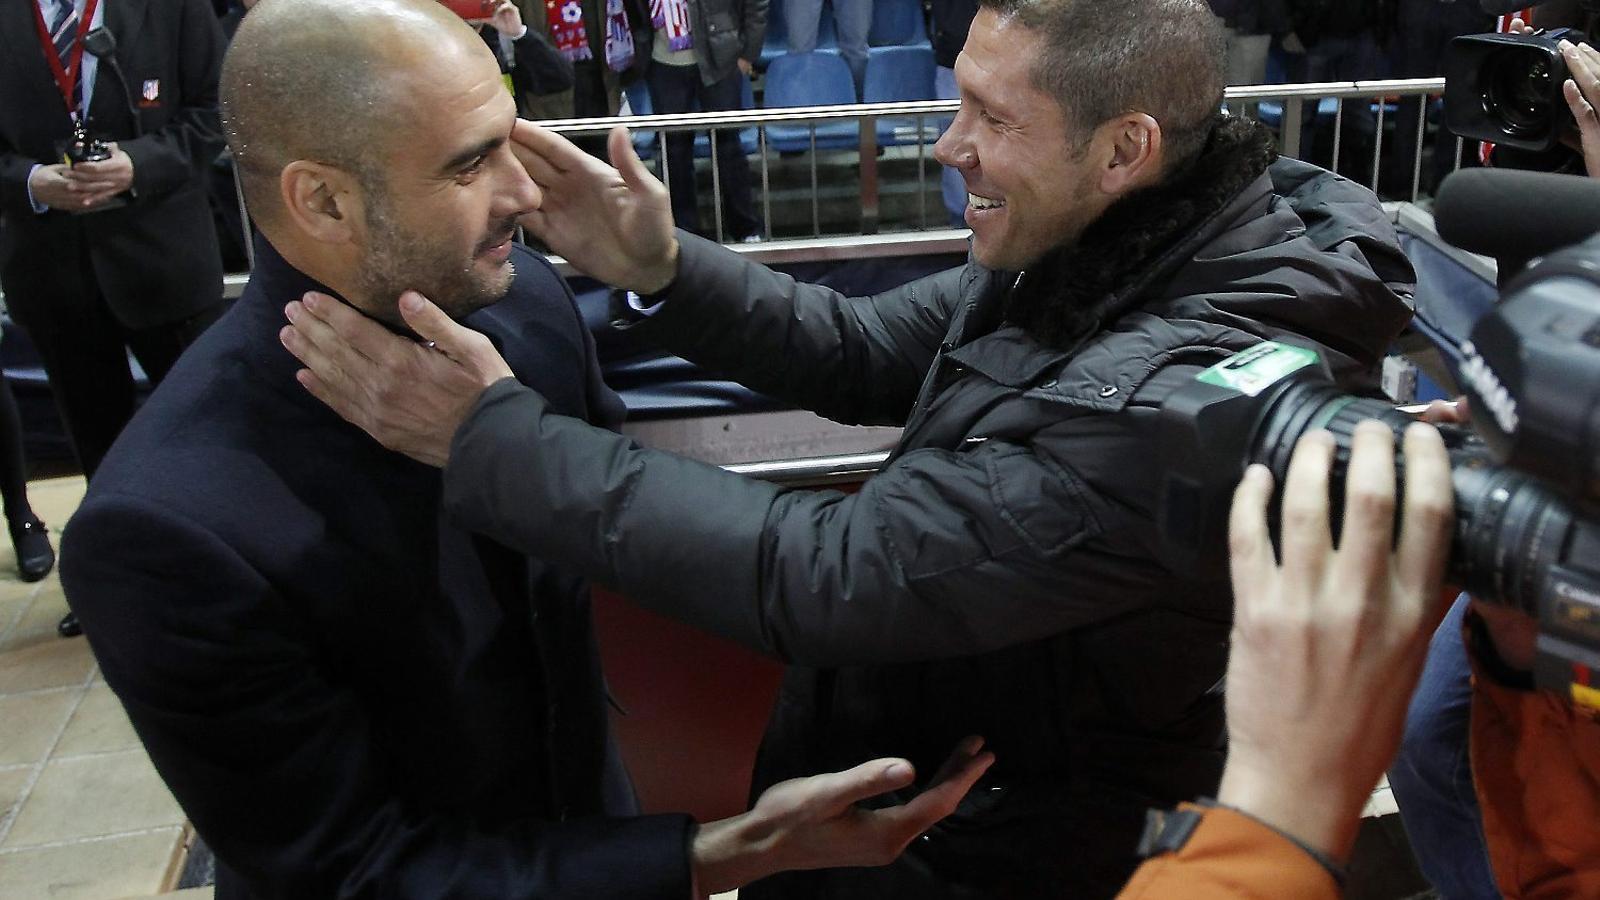 Pep Guardiola i Diego Simeone saludant-se abans d'un partit  al Calderón.